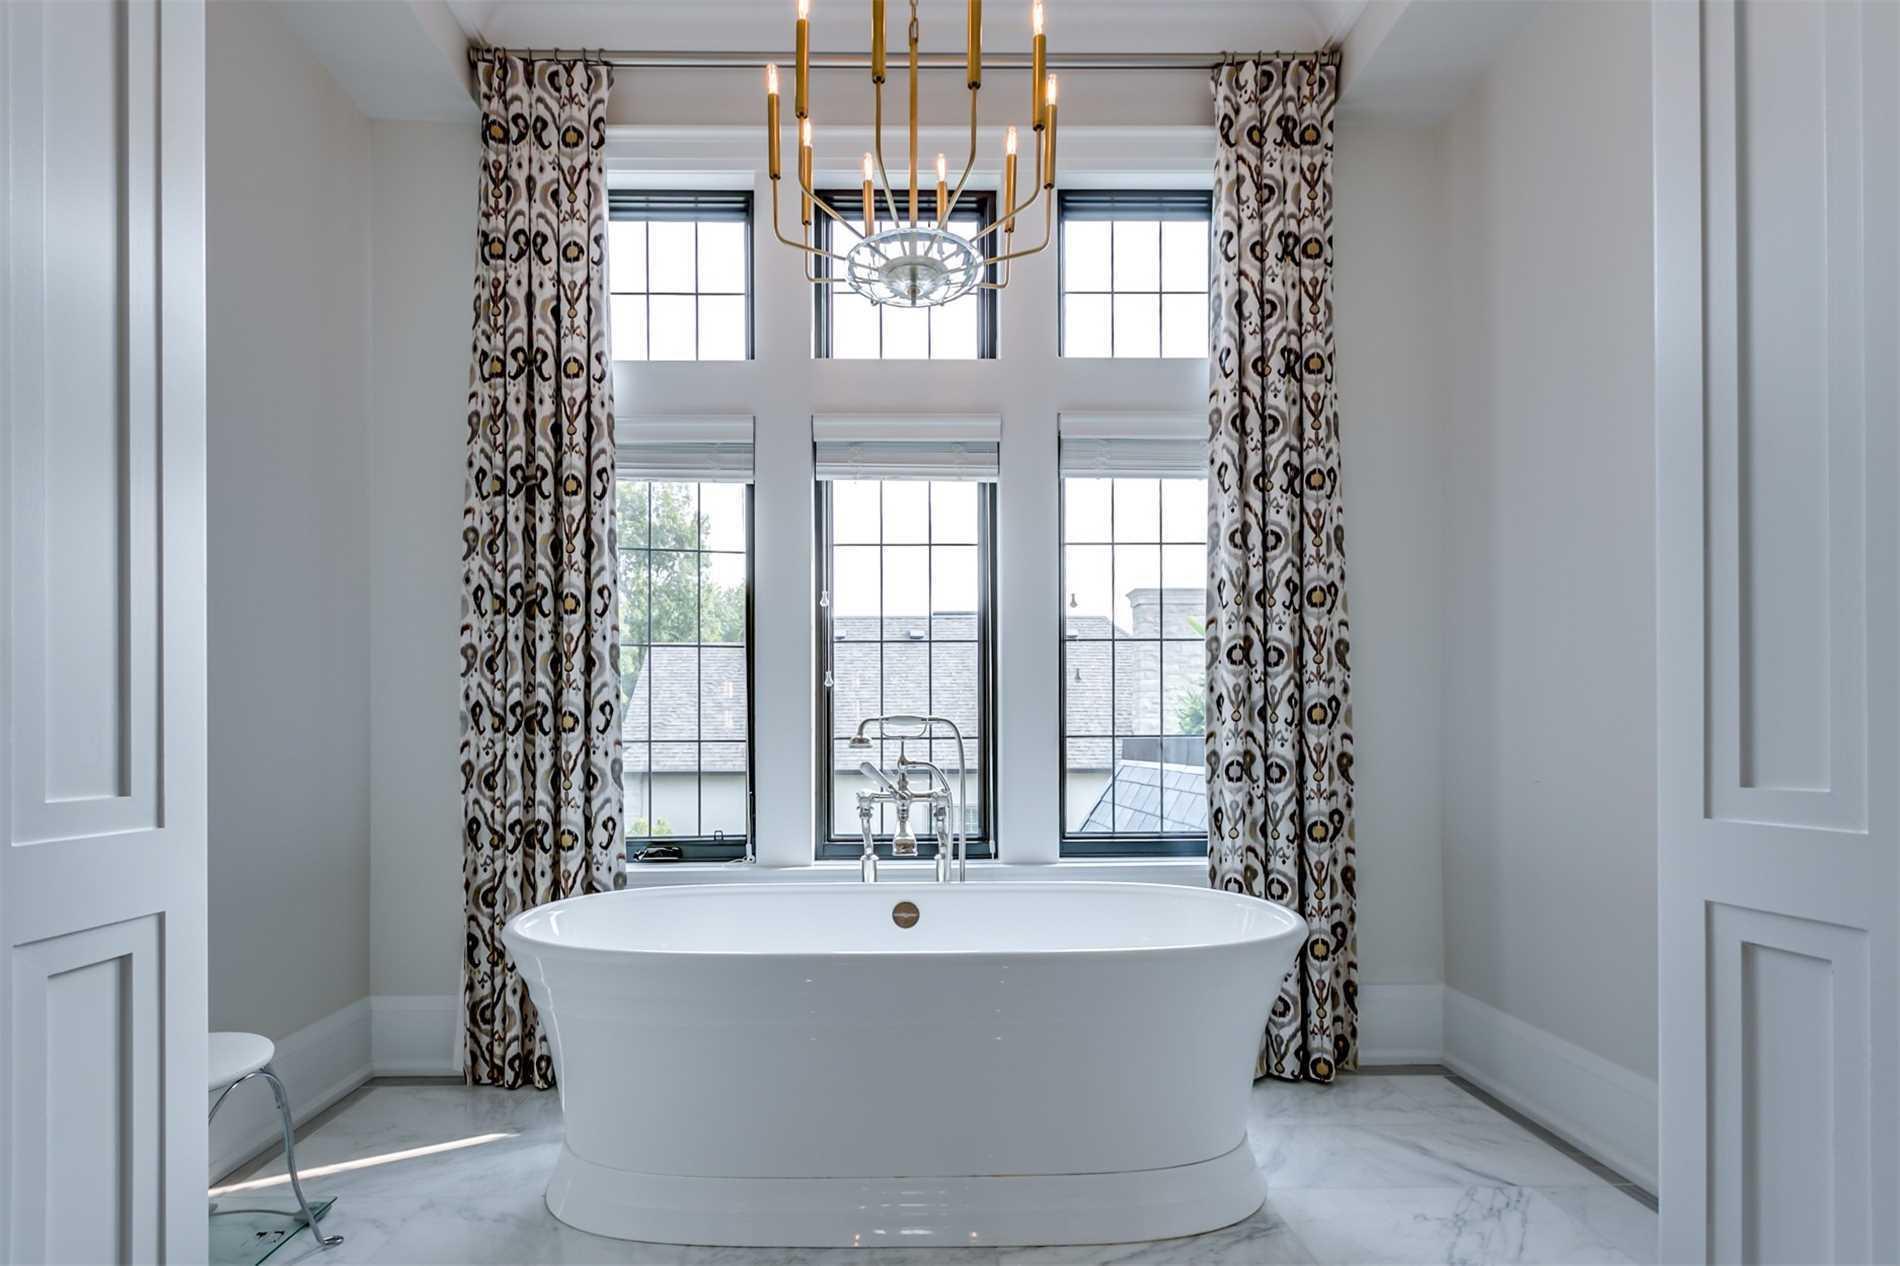 38 York Rd, Bridle Path-Sunnybrook-York Mills, Toronto, Ontario M2L 1H6, 5 Bedrooms Bedrooms, 11 Rooms Rooms,7 BathroomsBathrooms,Detached,For Sale,York,C4924810